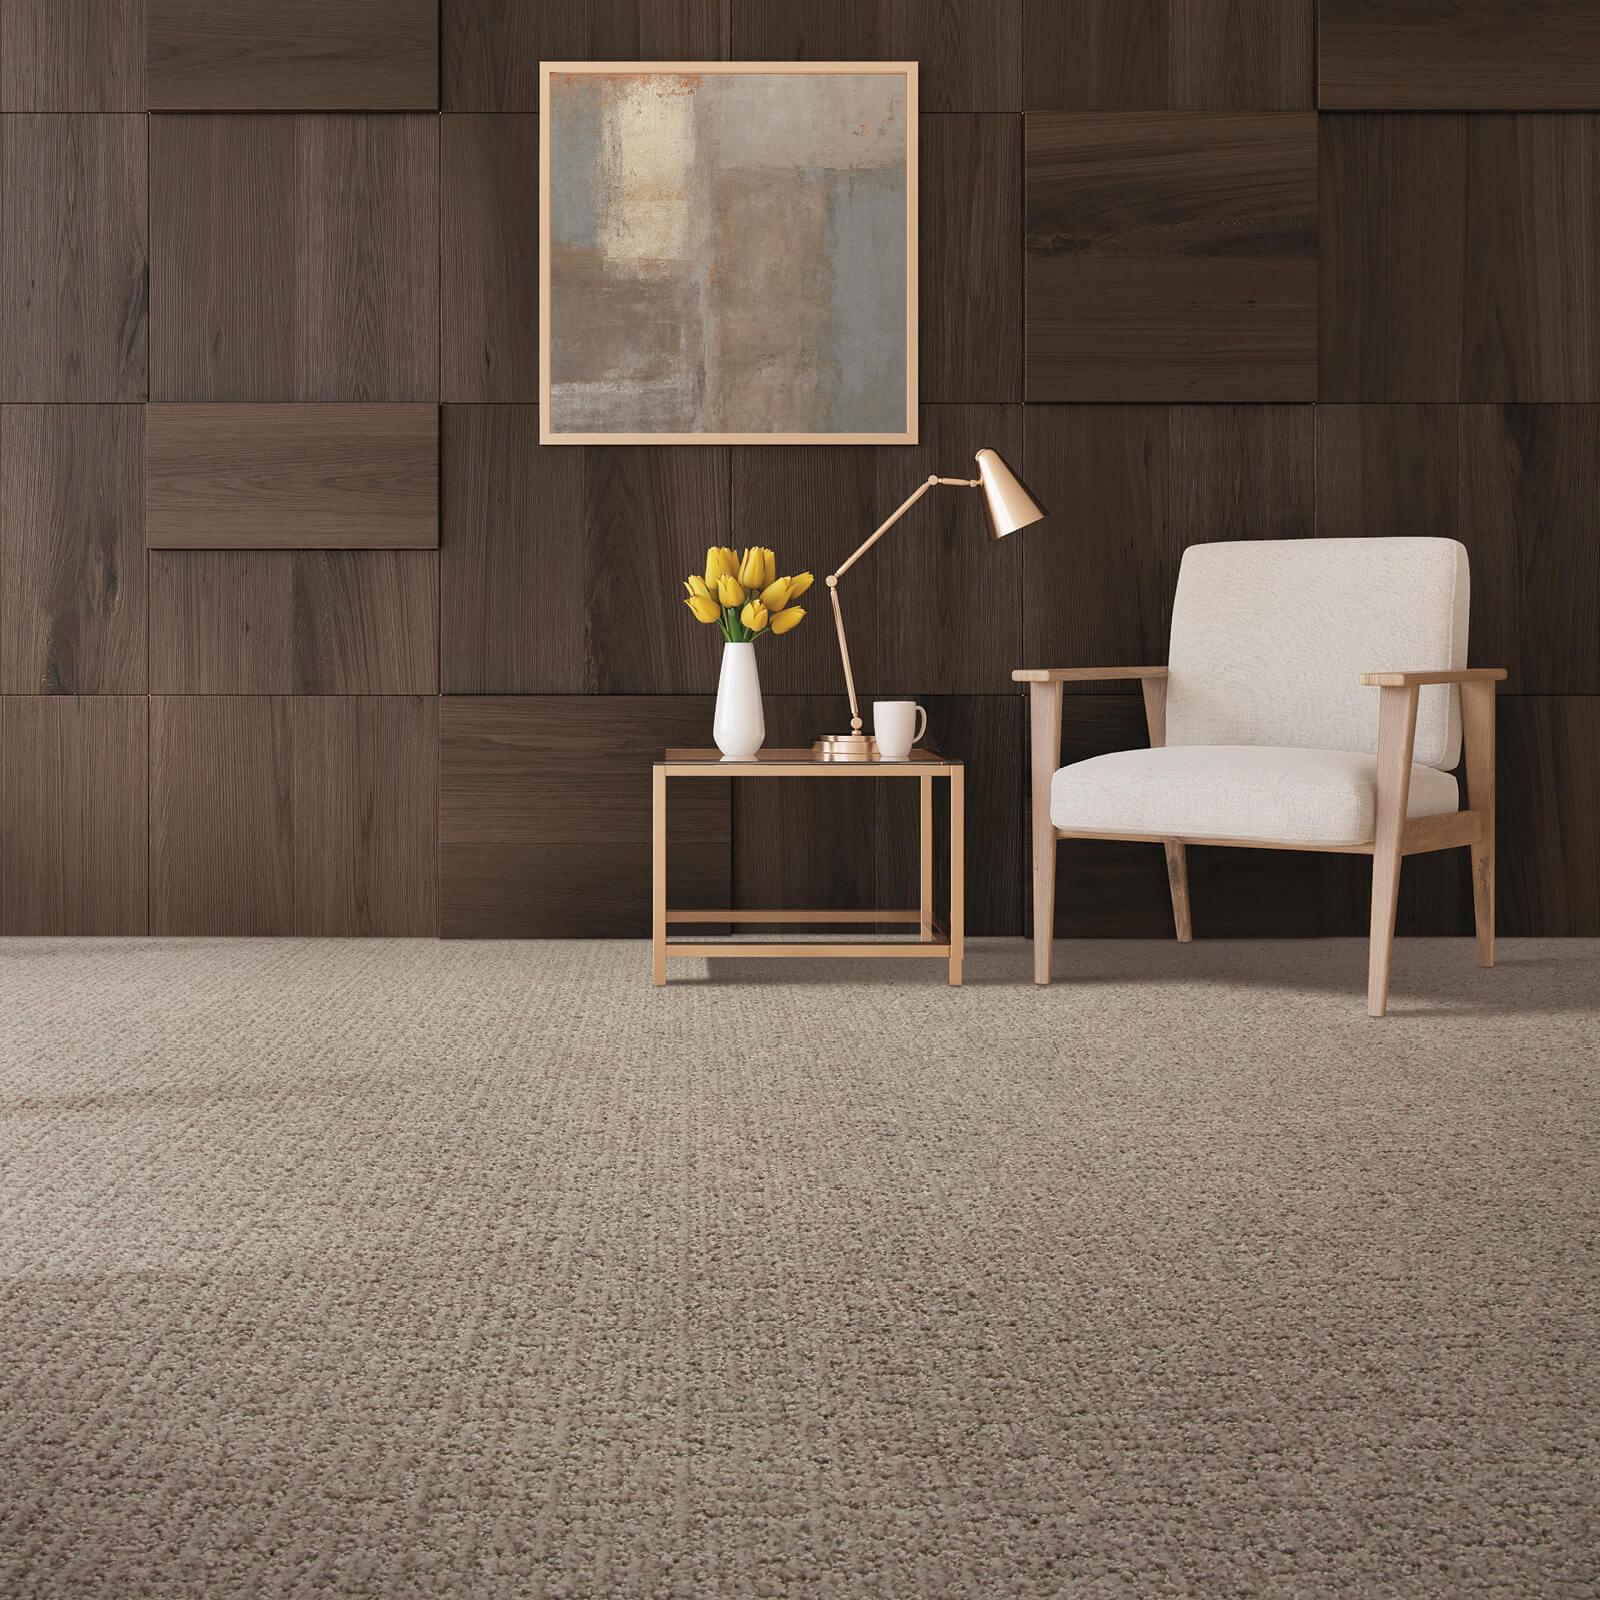 Stylish carpet design | Dolphin Carpet & Tile